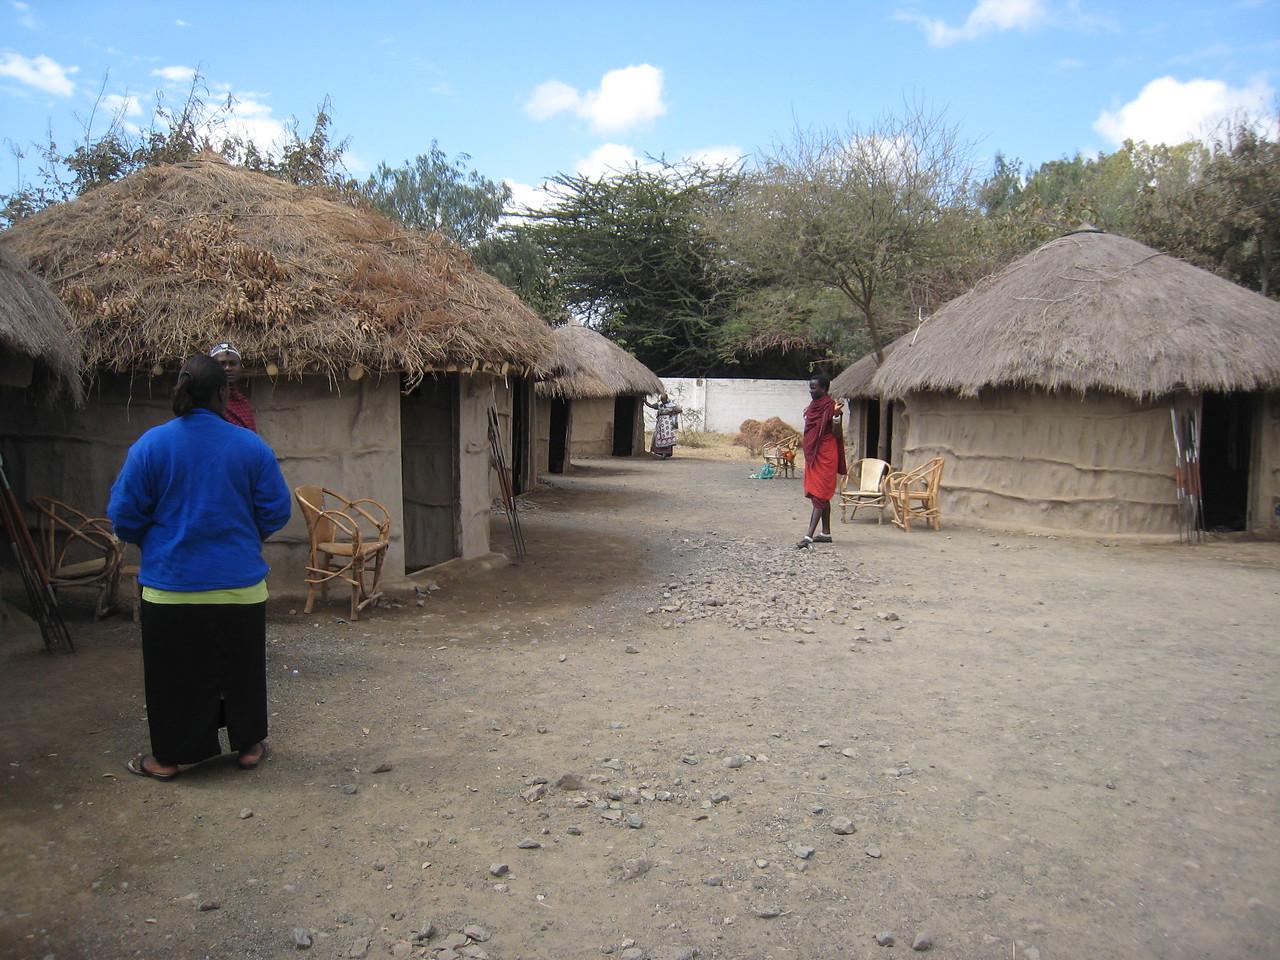 Maasai Village at Meserani in Tanzania.